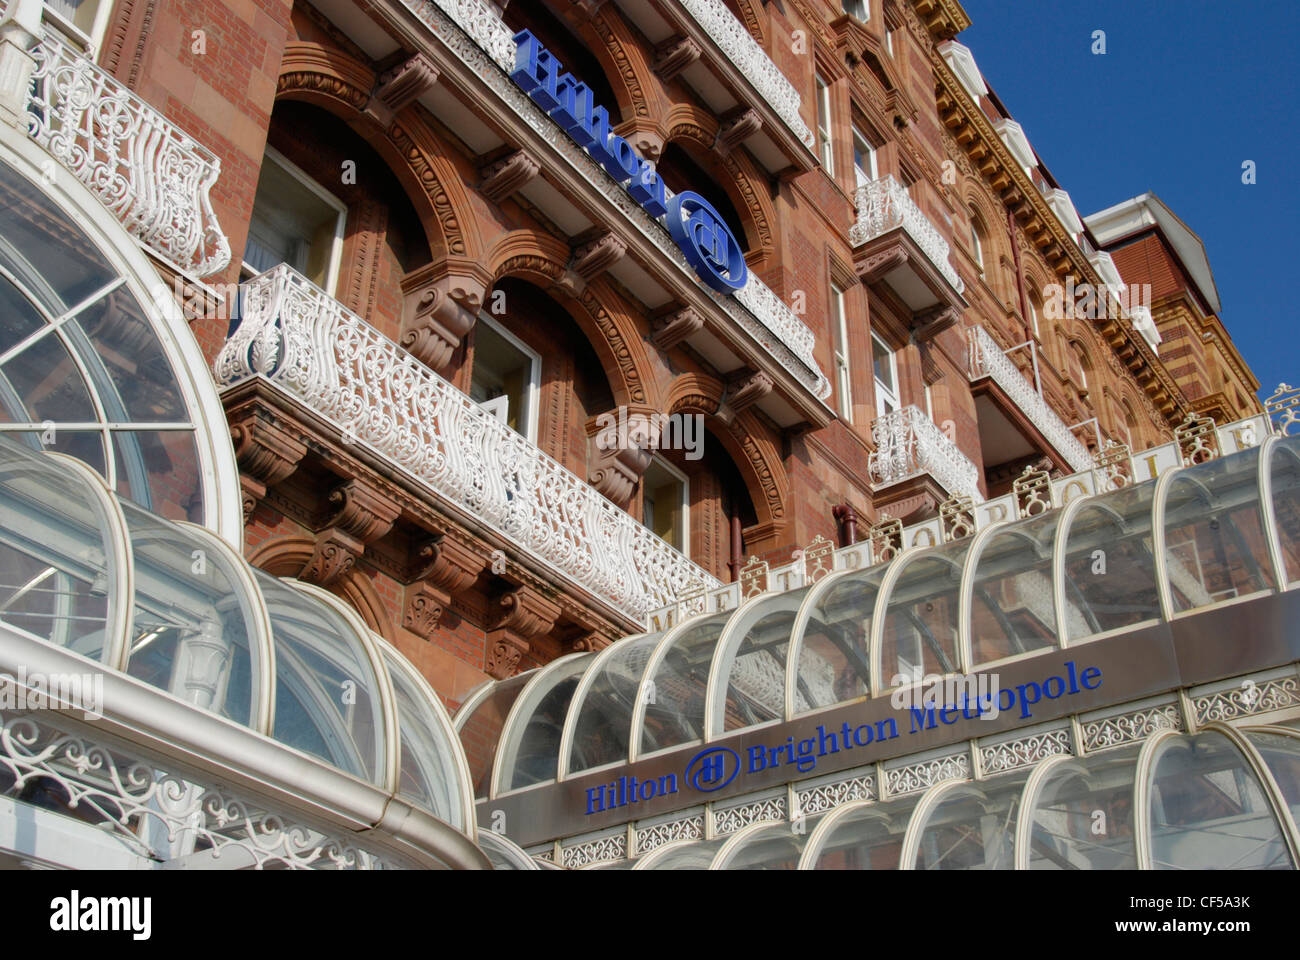 Die Fassade des Hotels Hilton Brighton Metropole. Stockbild